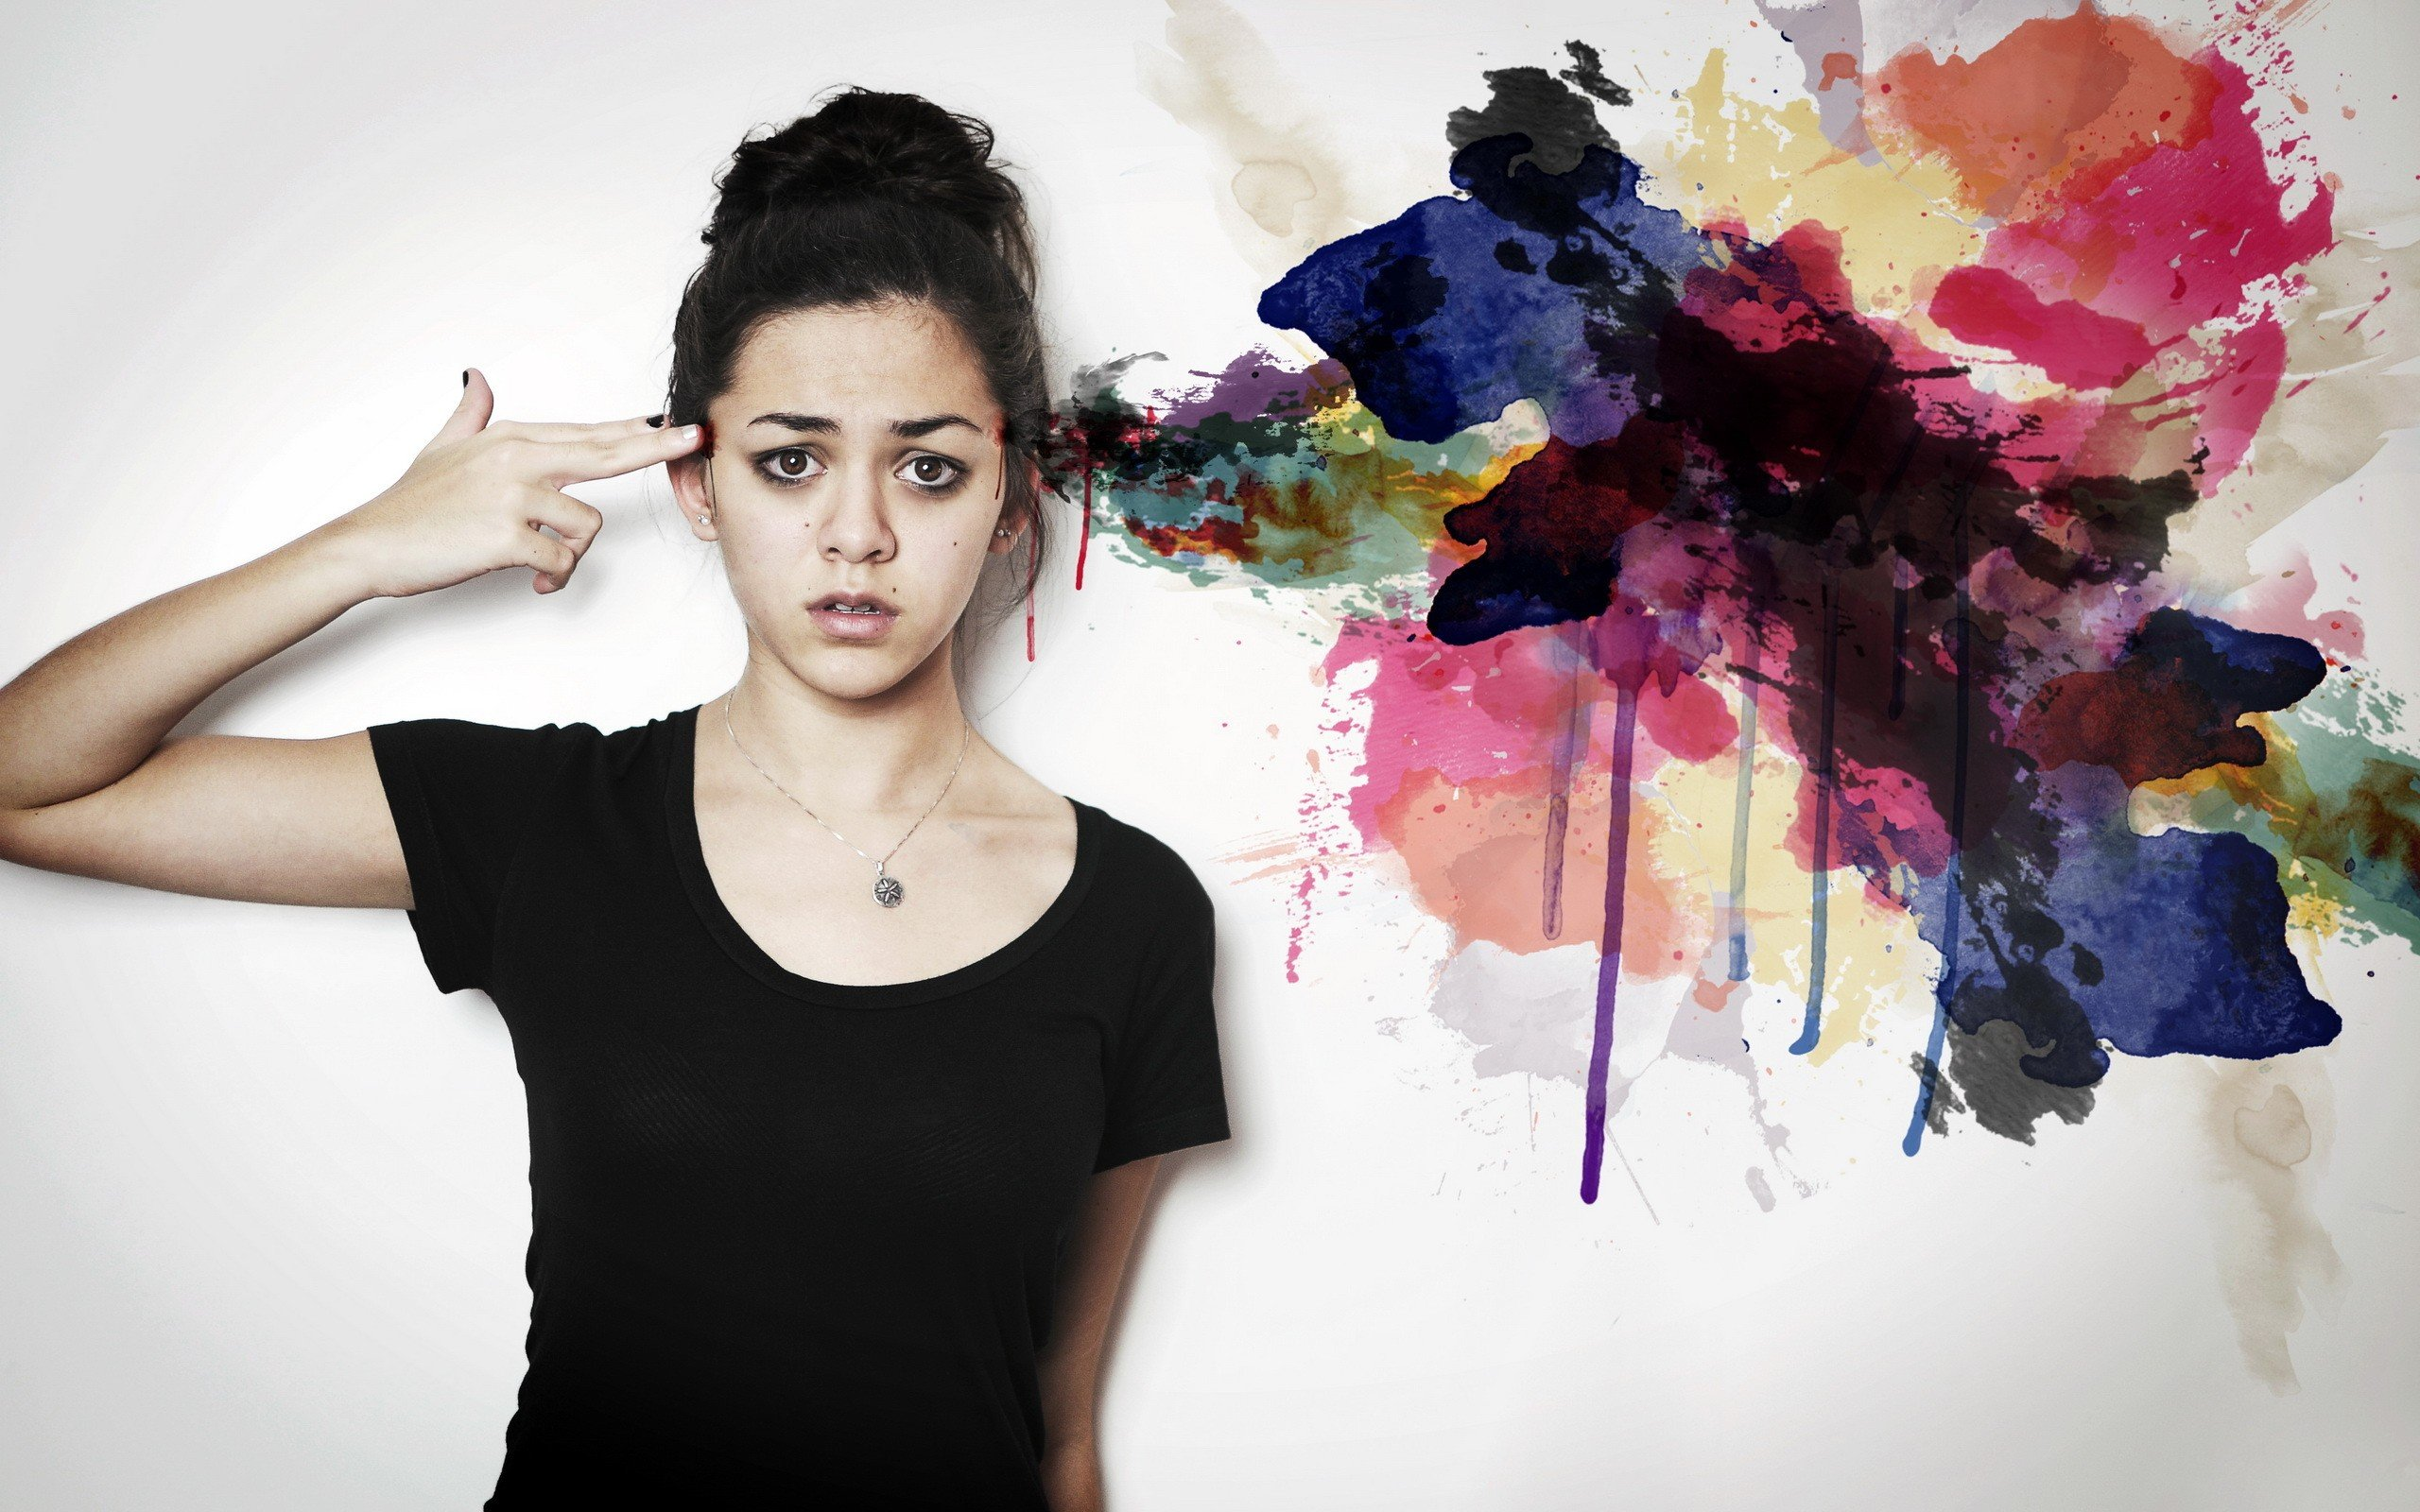 women, Artwork, Model, Hands on head, Colorful Wallpaper